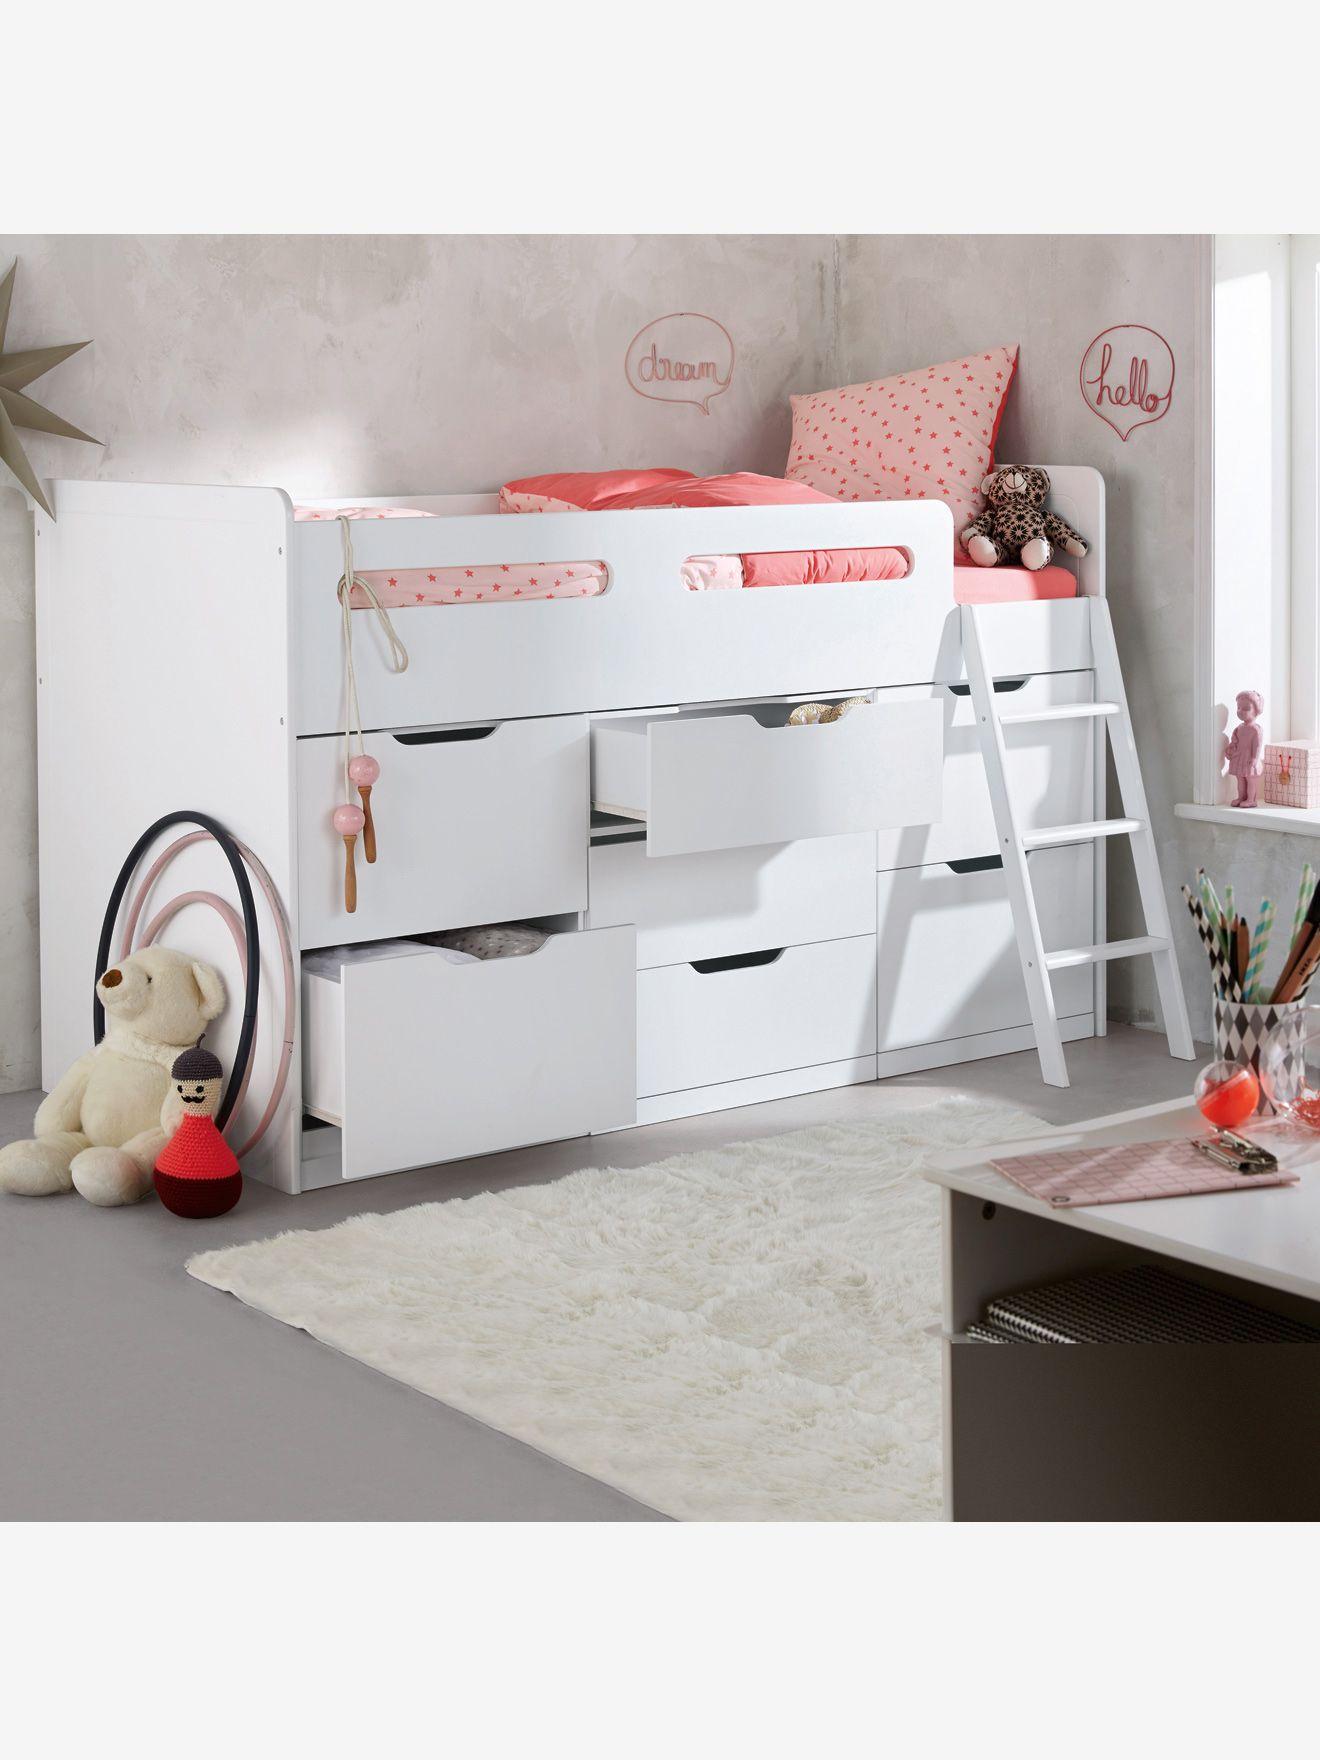 Combine Lit Enfant Avec Rangements Ligne Passe Passe Xxl Blanc Vertbaudet Loft Betten Bett Kinderzimmer Kinderzimmer Dekor